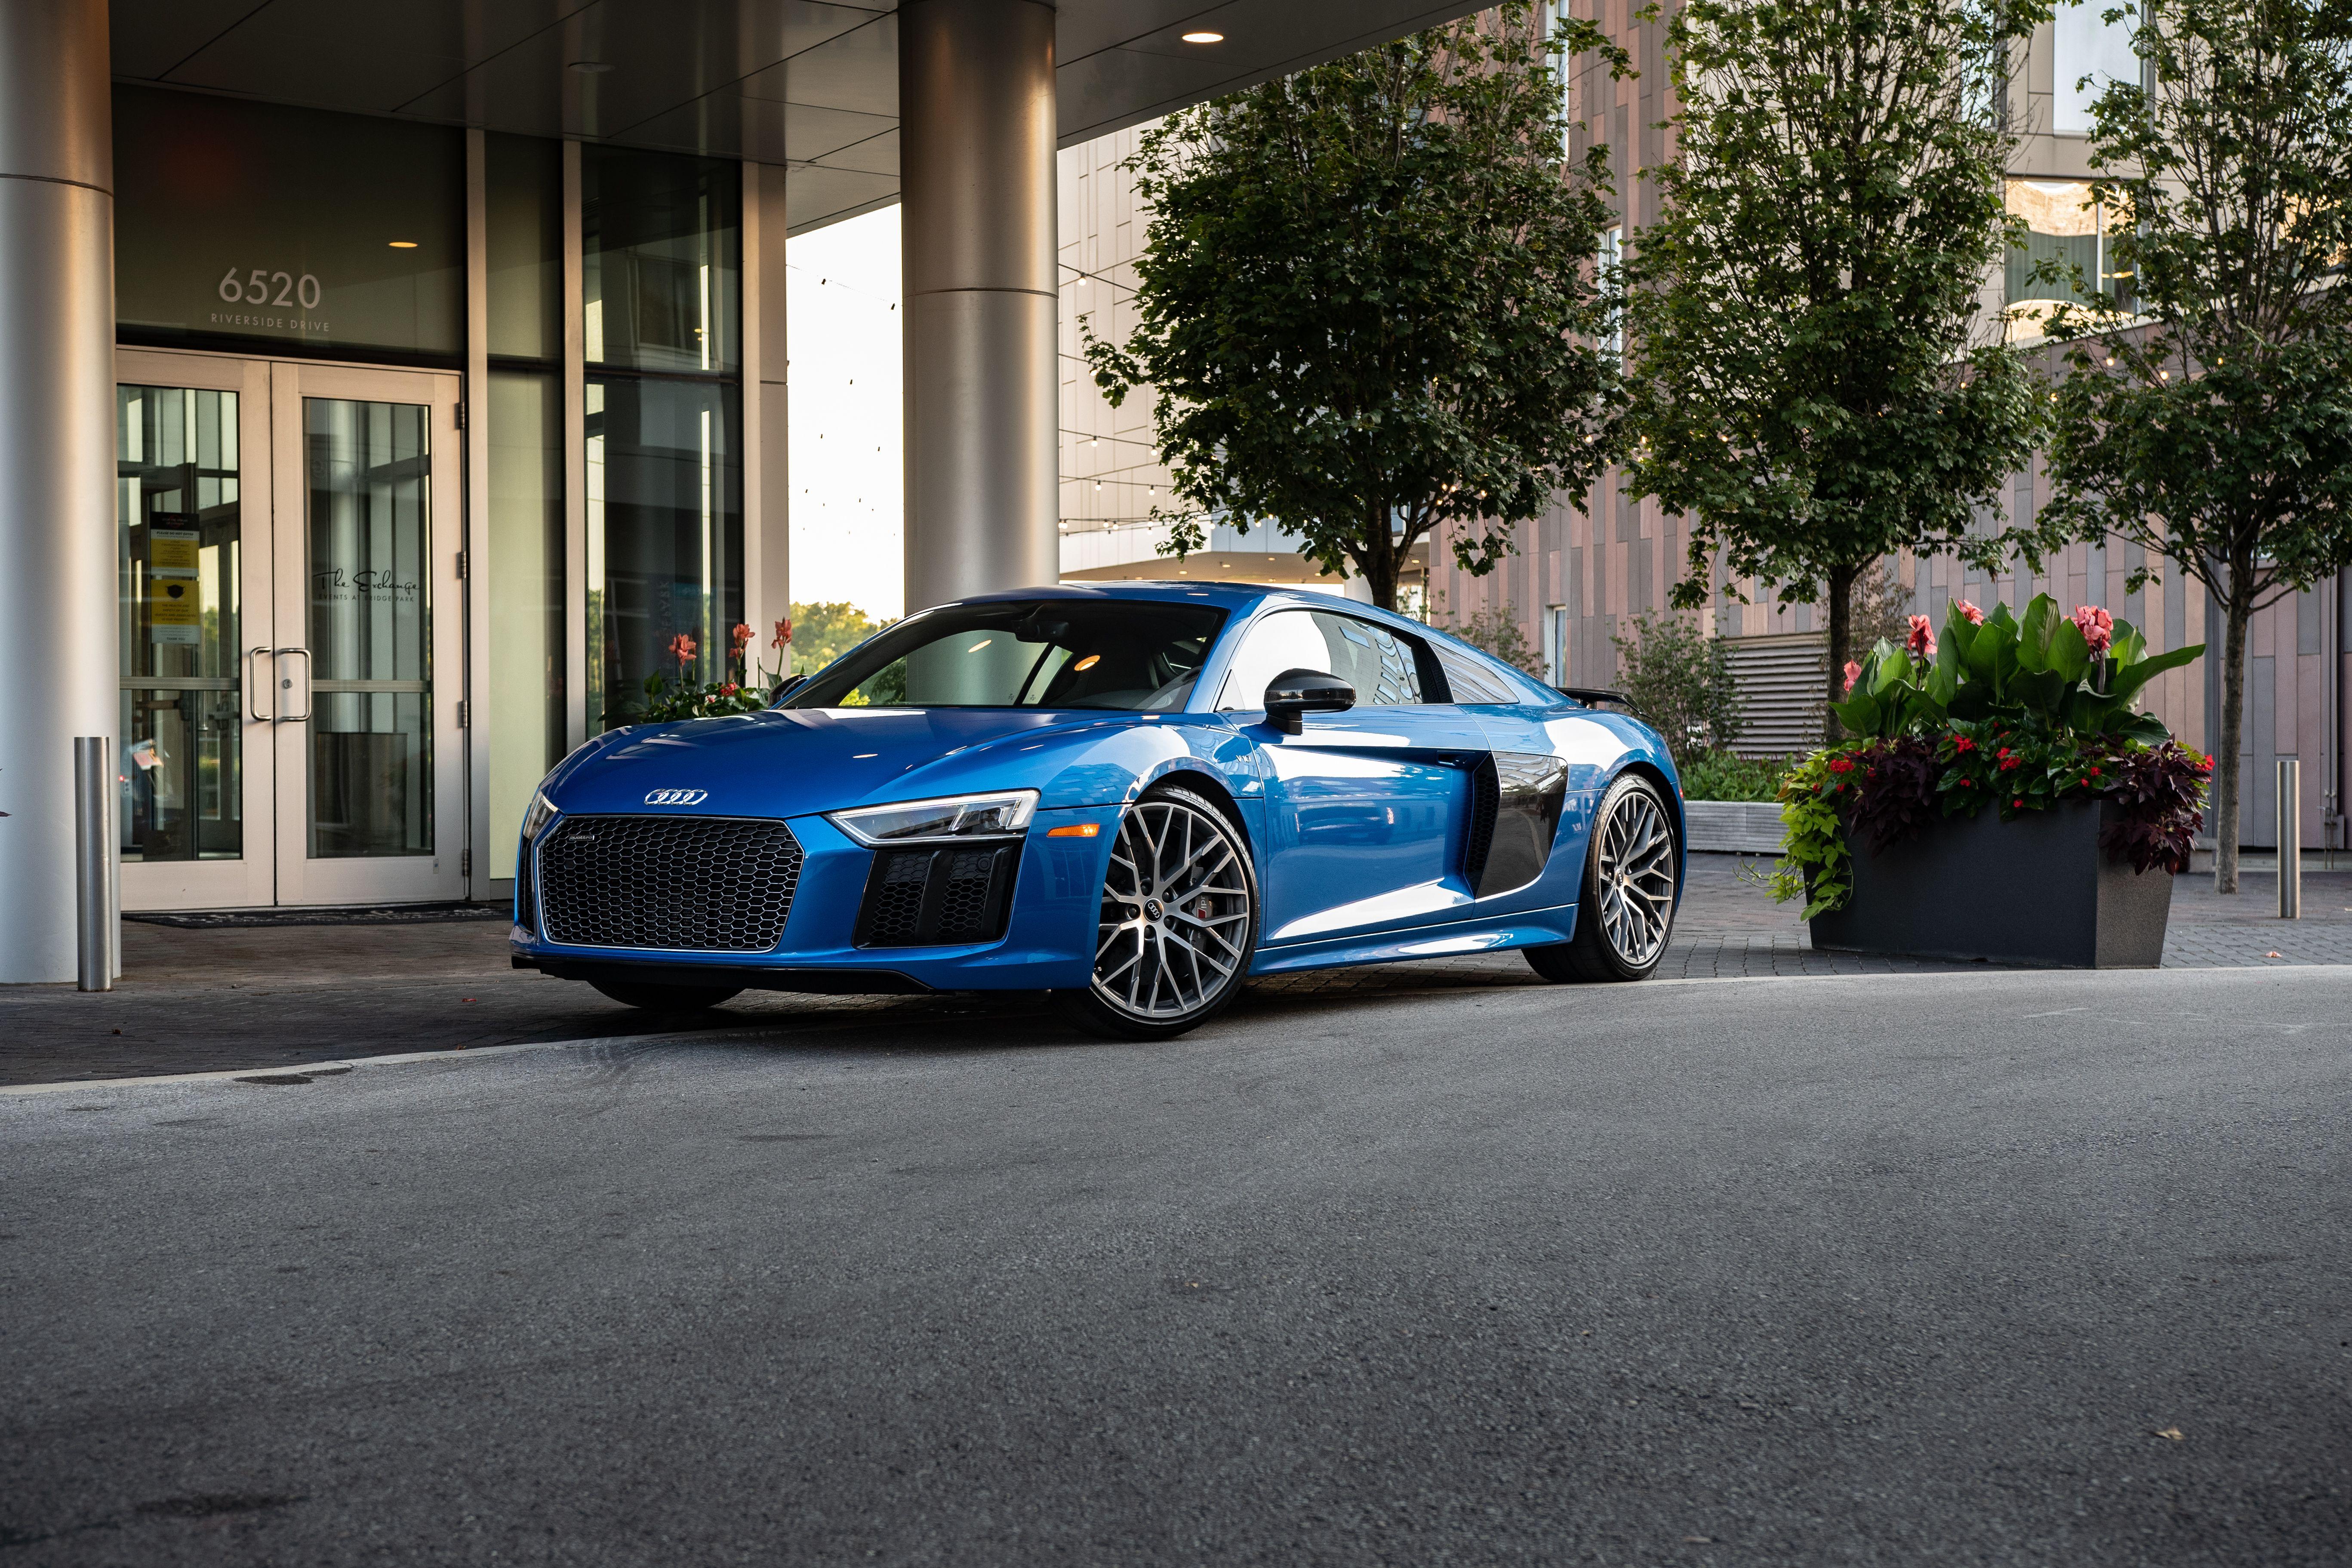 Audi R8 V10 Plus Audi R8 V10 Plus Audi R8 Audi R8 V10